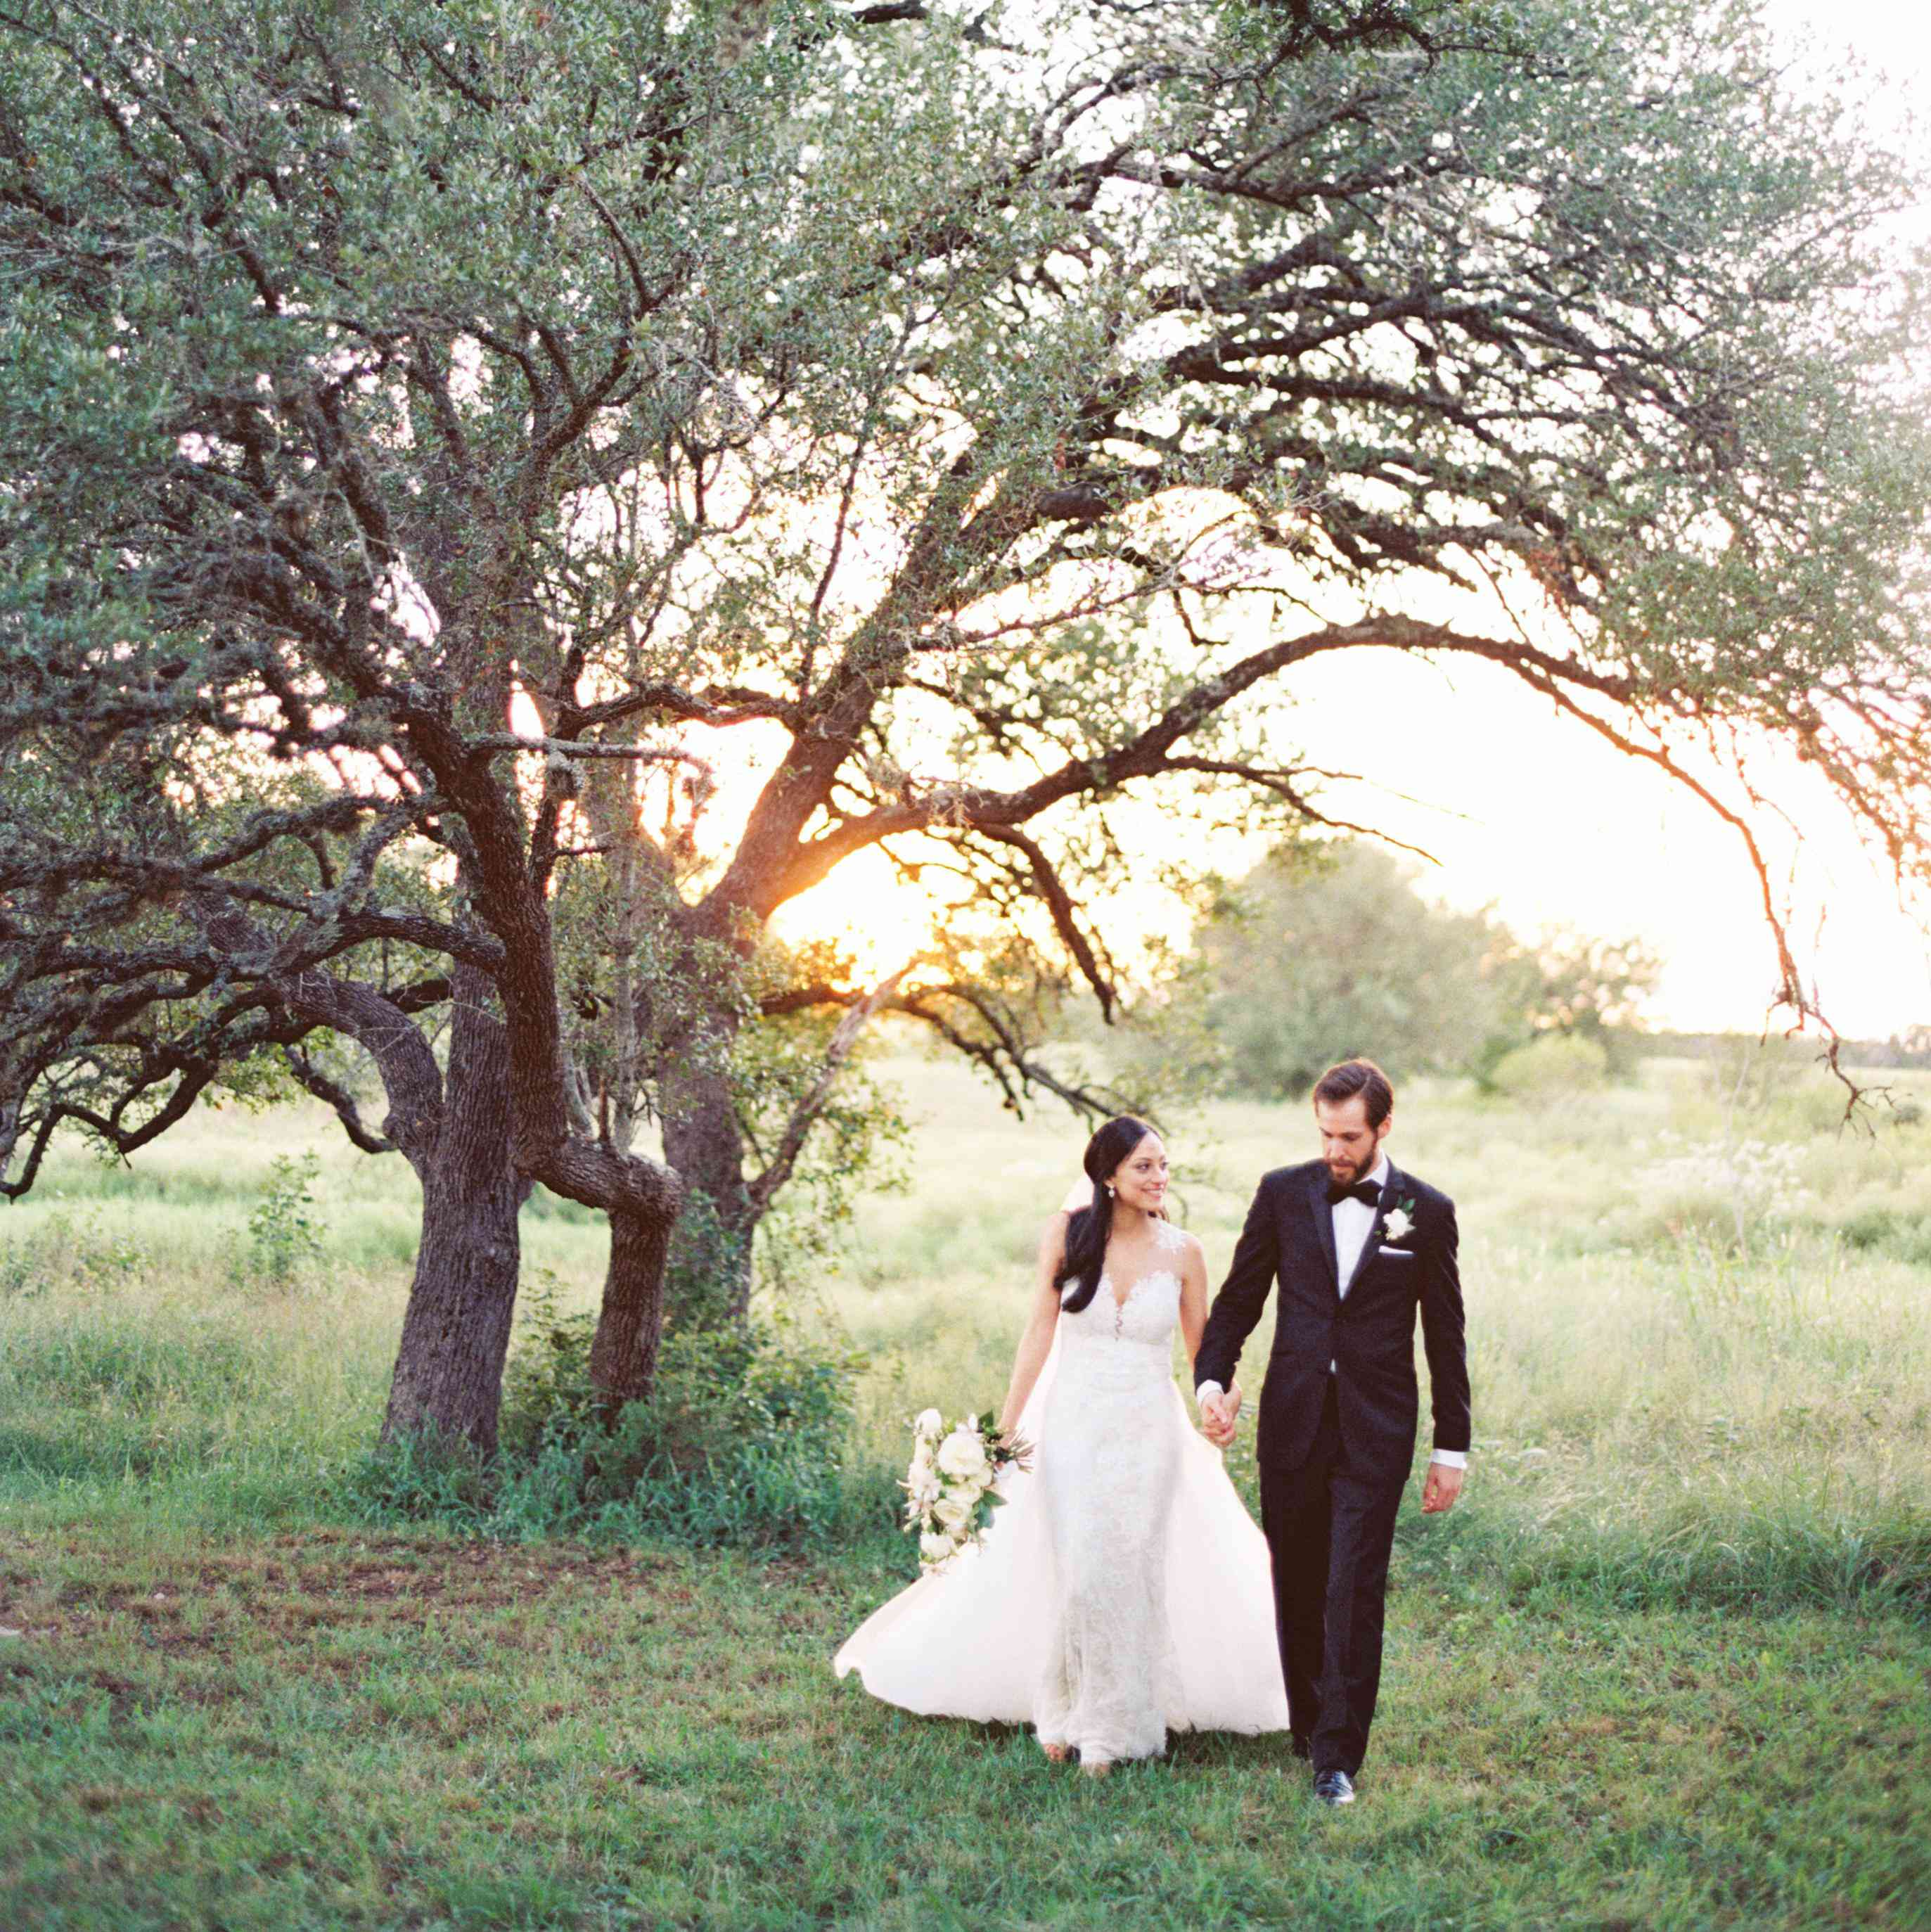 An Elegant Texas Wedding With Southern Charm